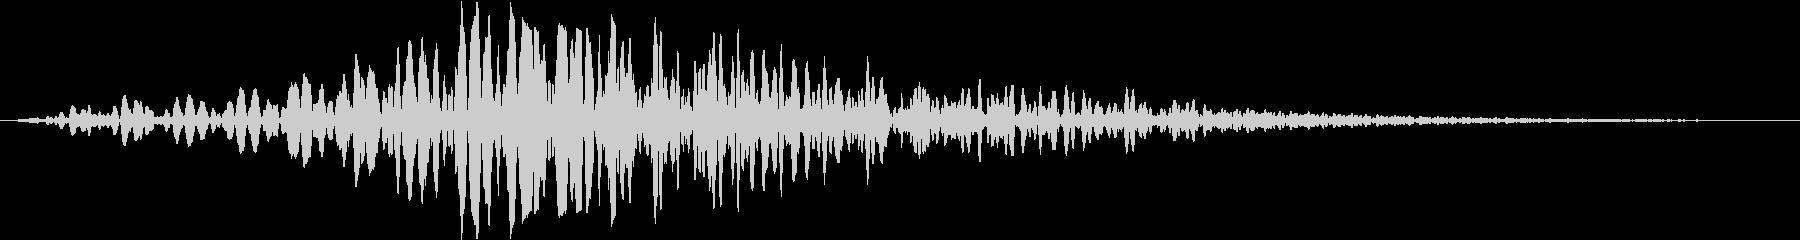 SF通過音02-02の未再生の波形